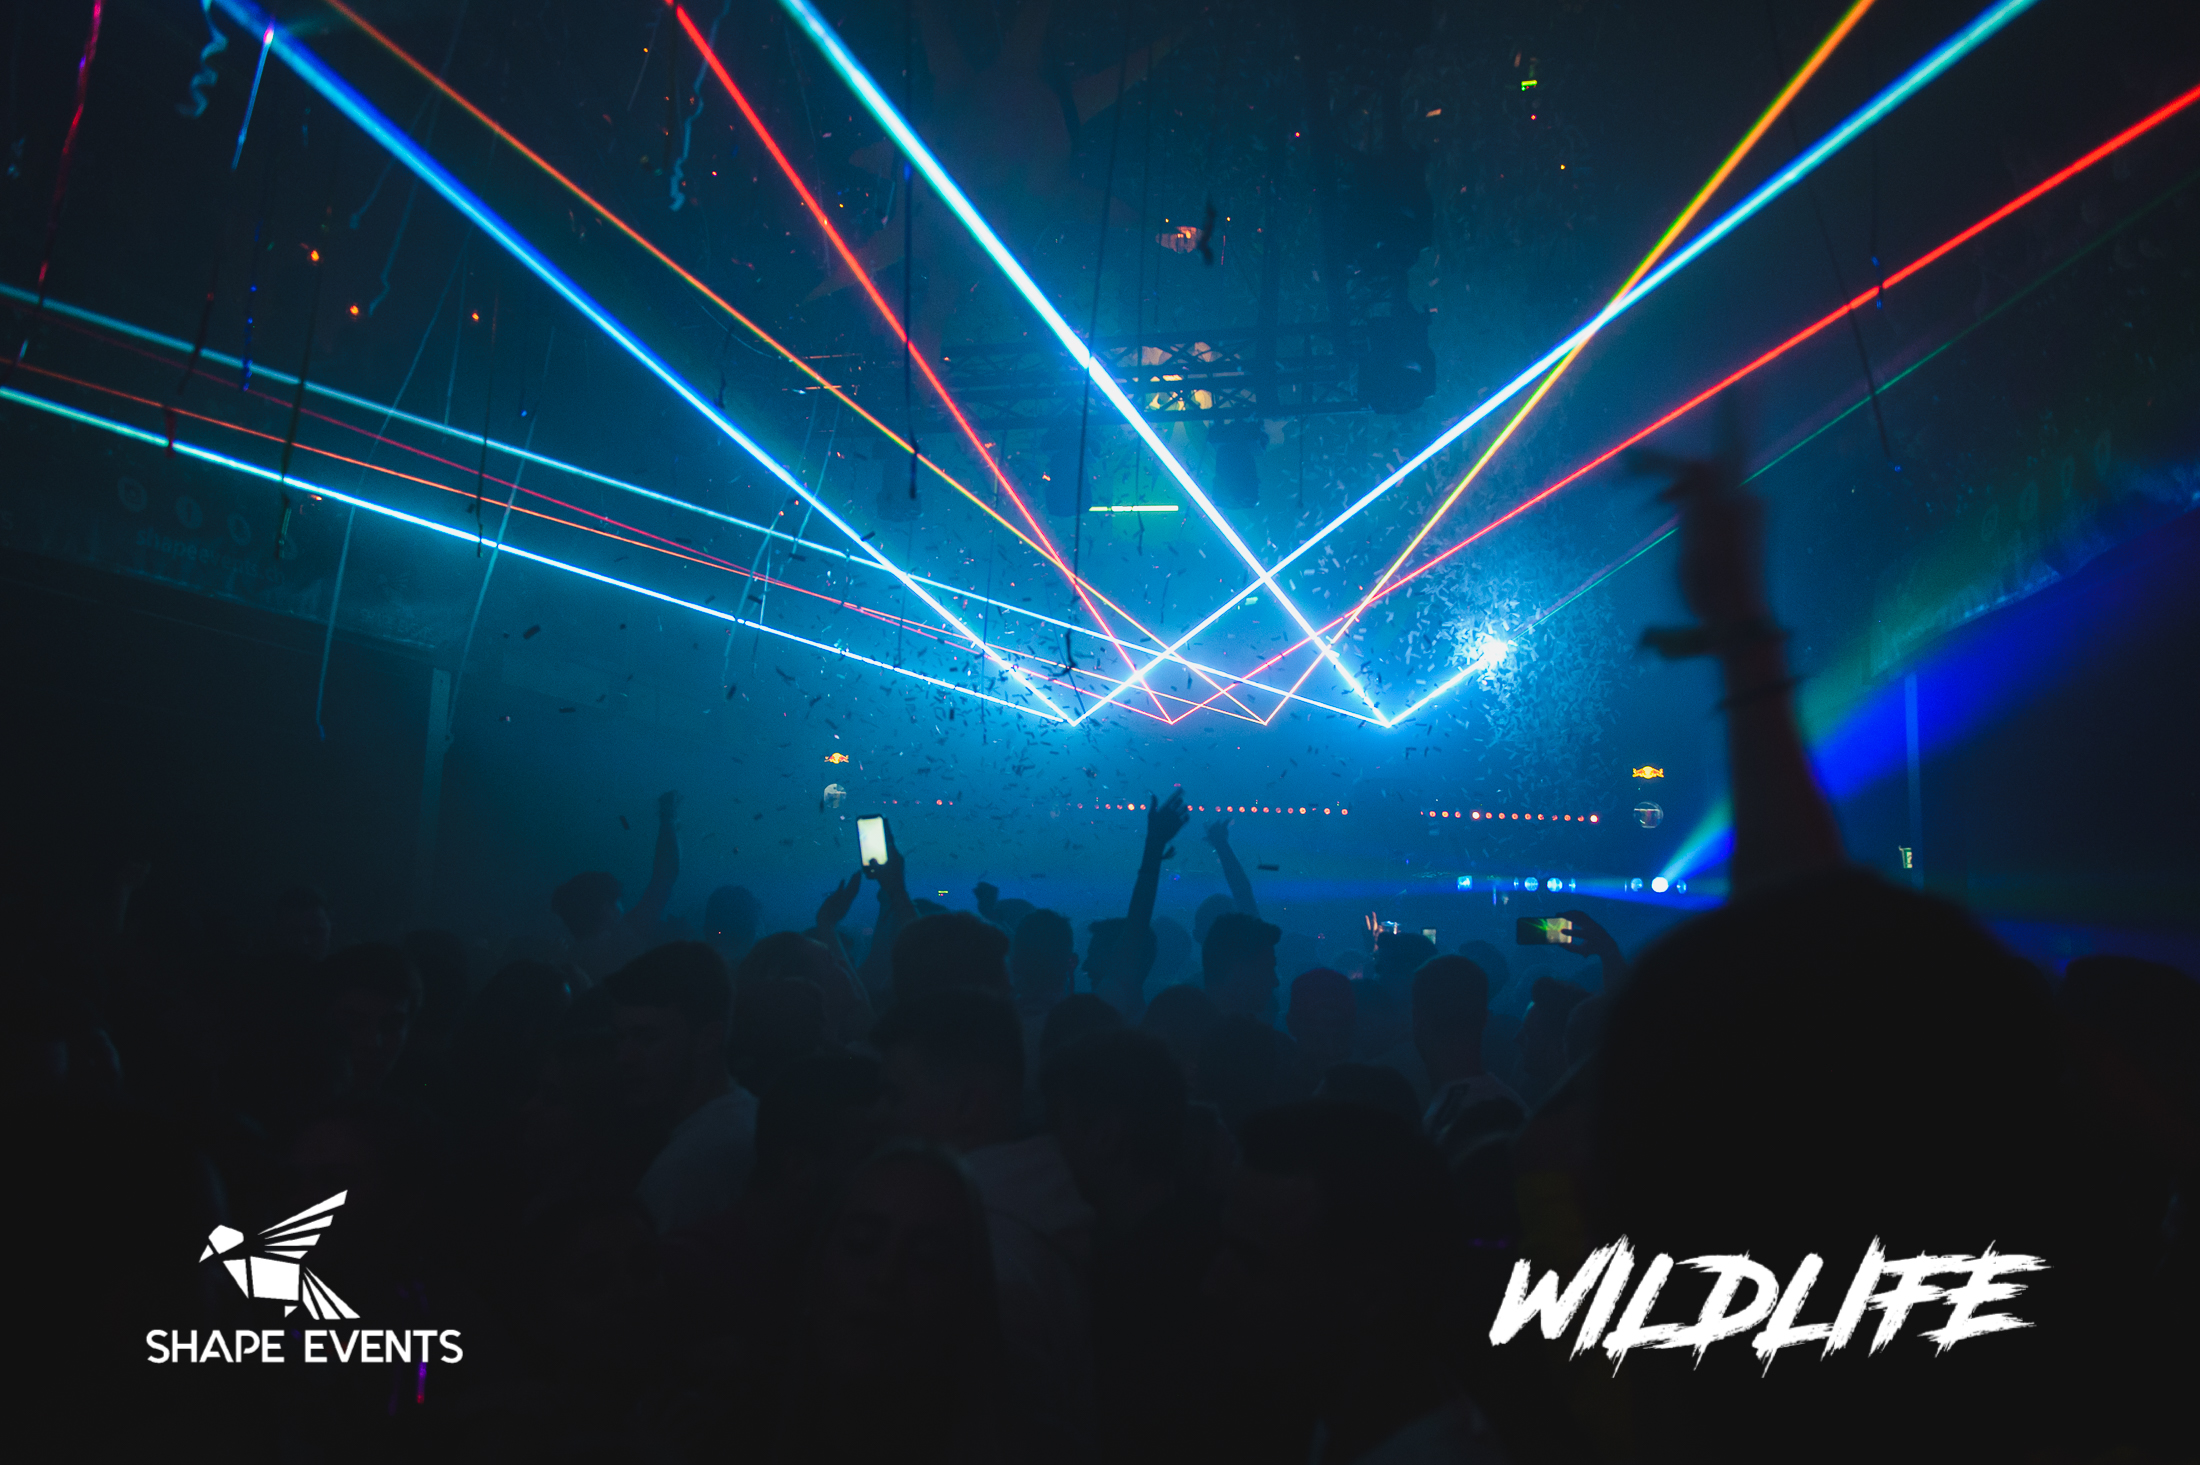 Wildlife-7.jpg